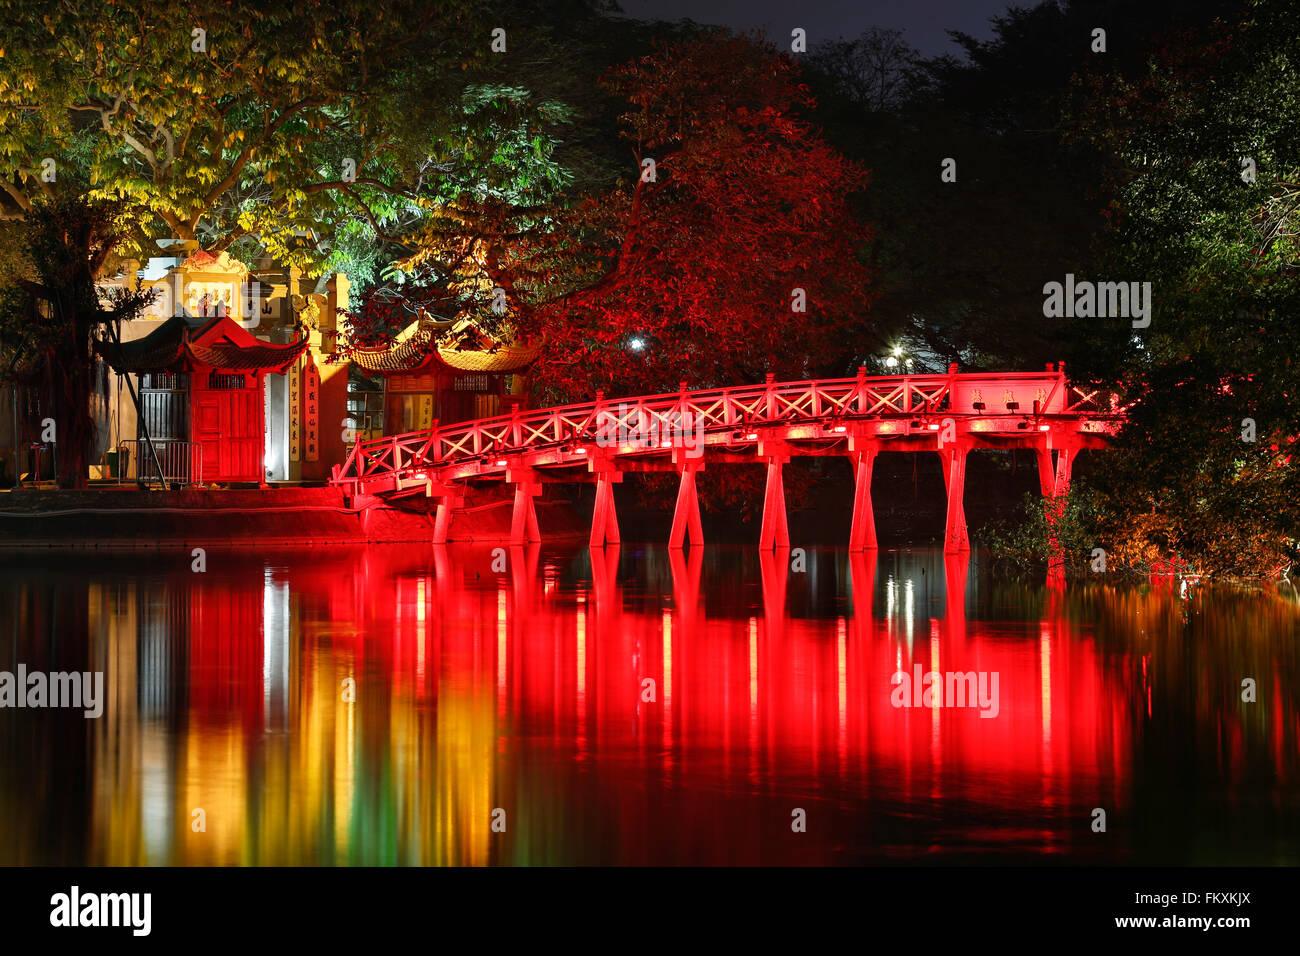 Red bridge reflecting on water, Ngoc Son Temple (Temple of the Jade Mountain), Hoan Kiem Lake, Old Quarter, Hanoi, - Stock Image